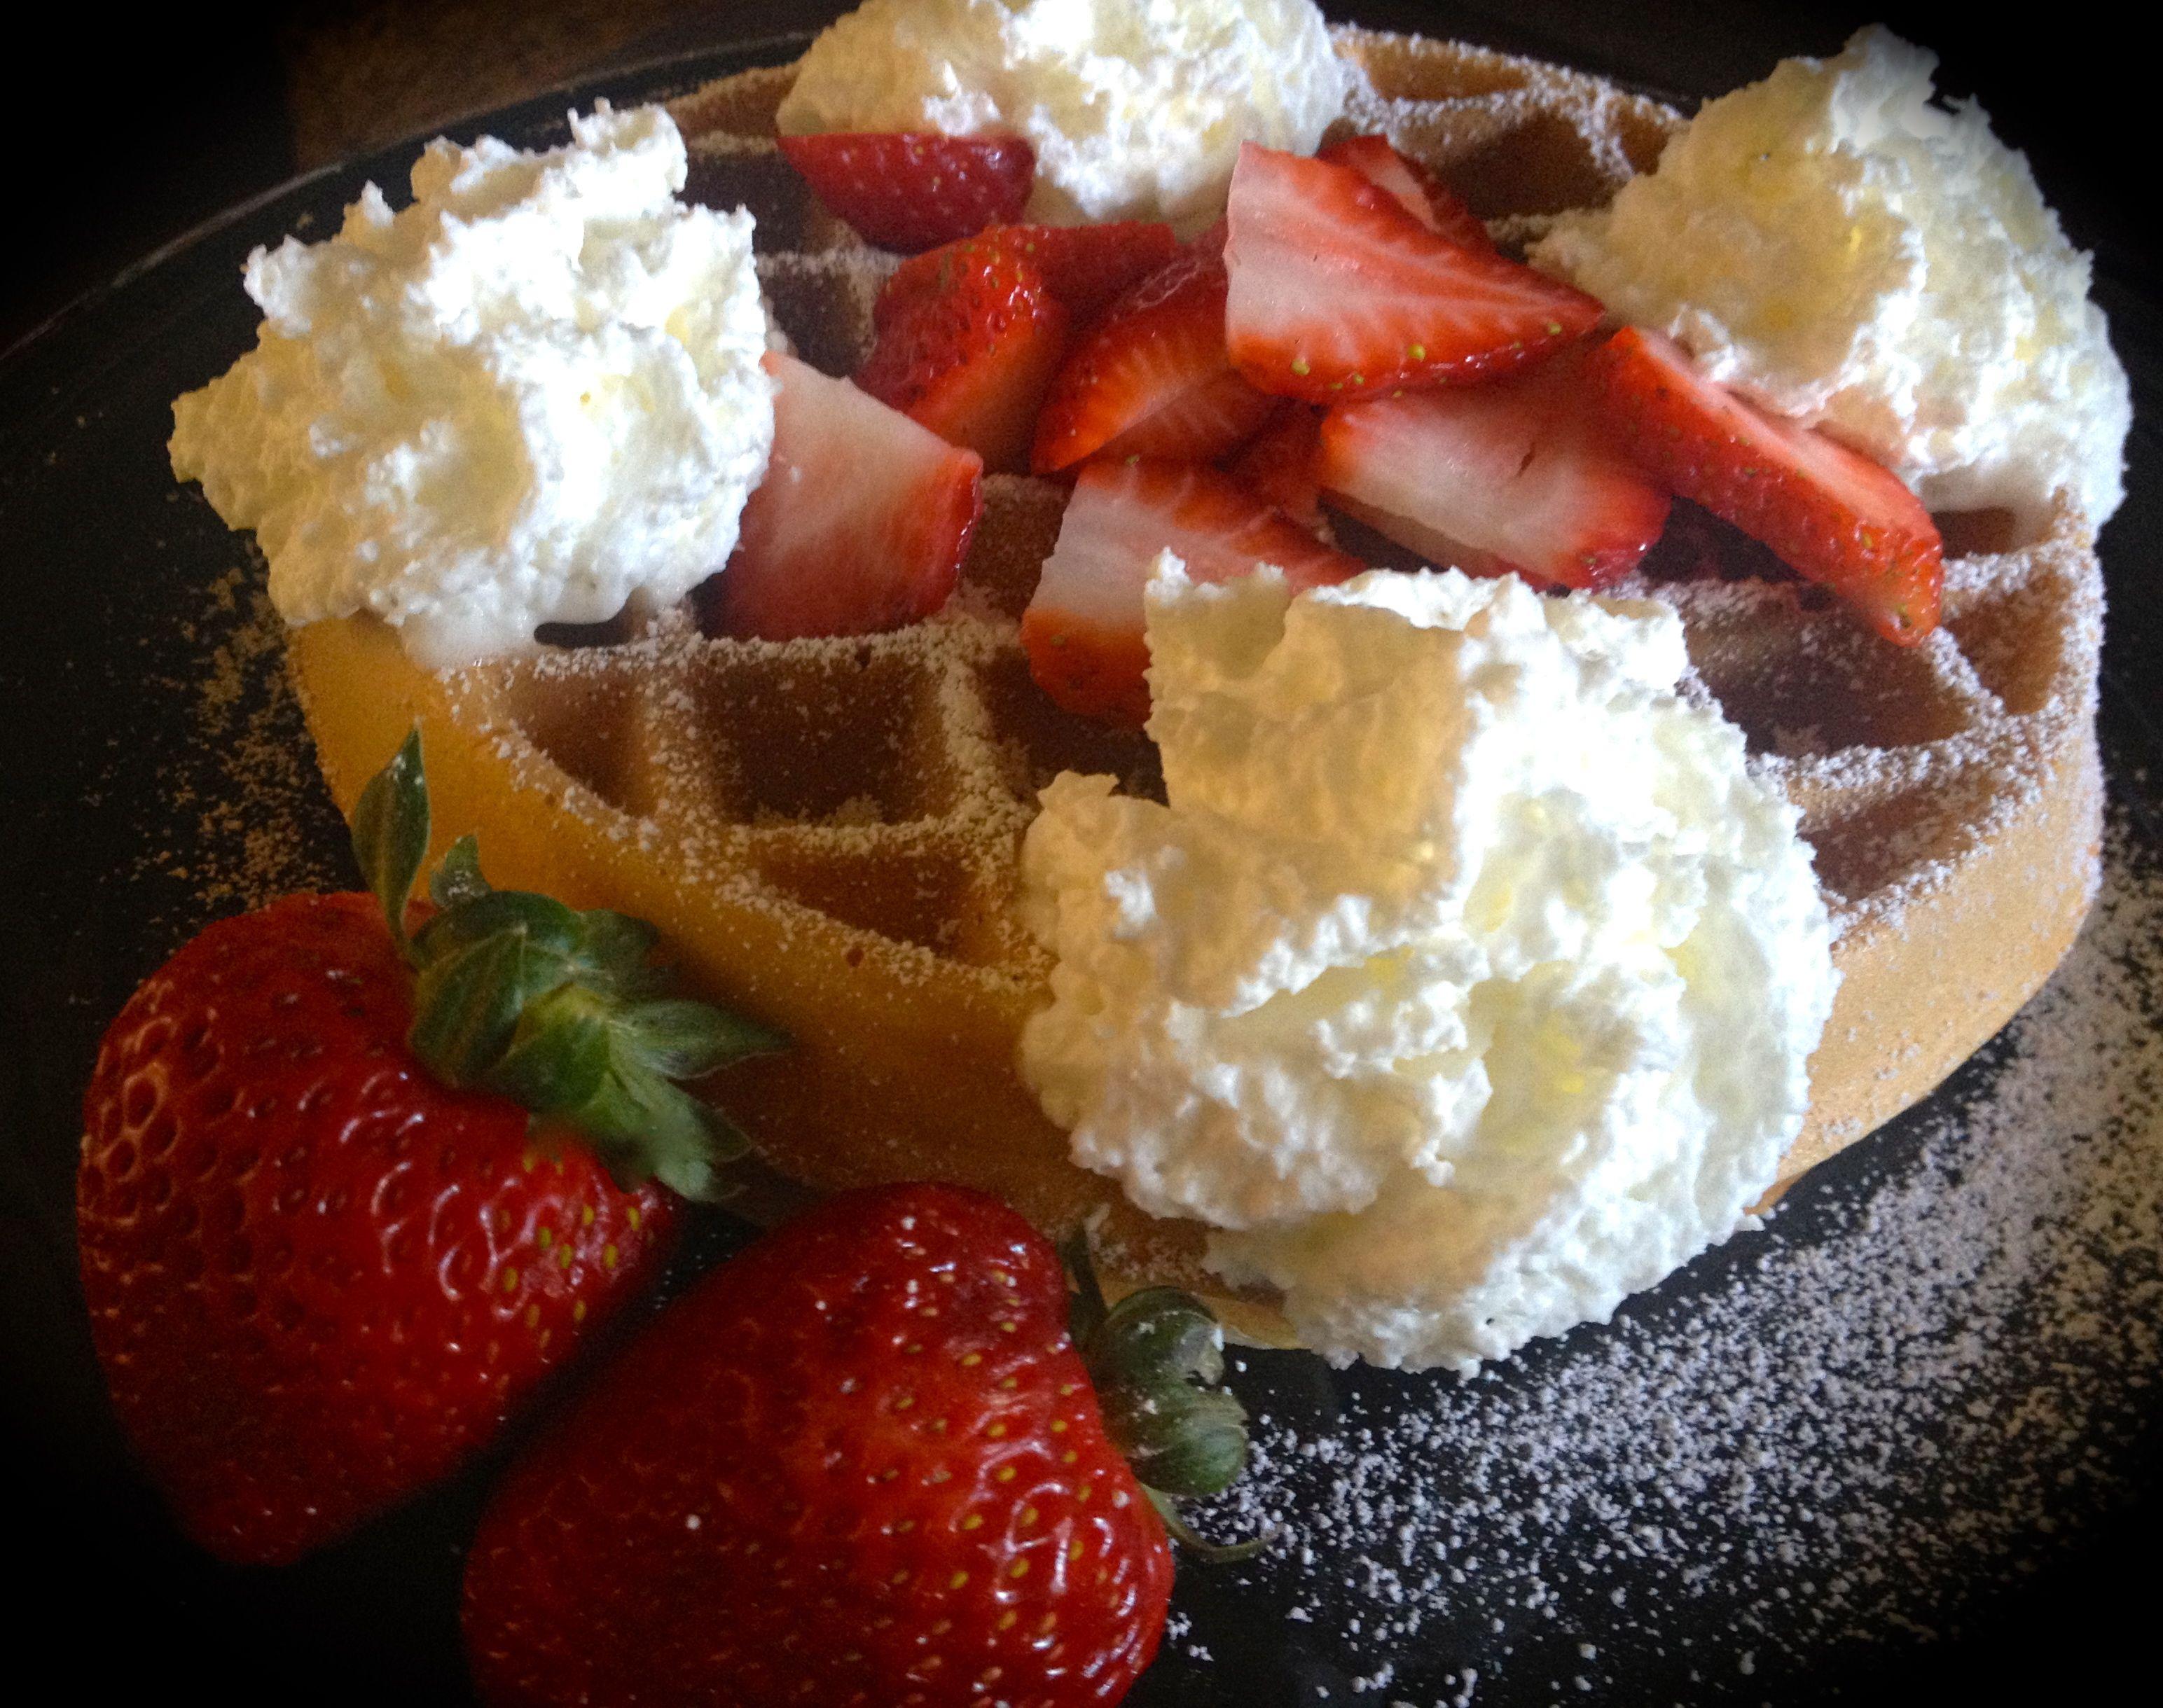 Crispy light Strawberry Vanilla Waffle & Cream